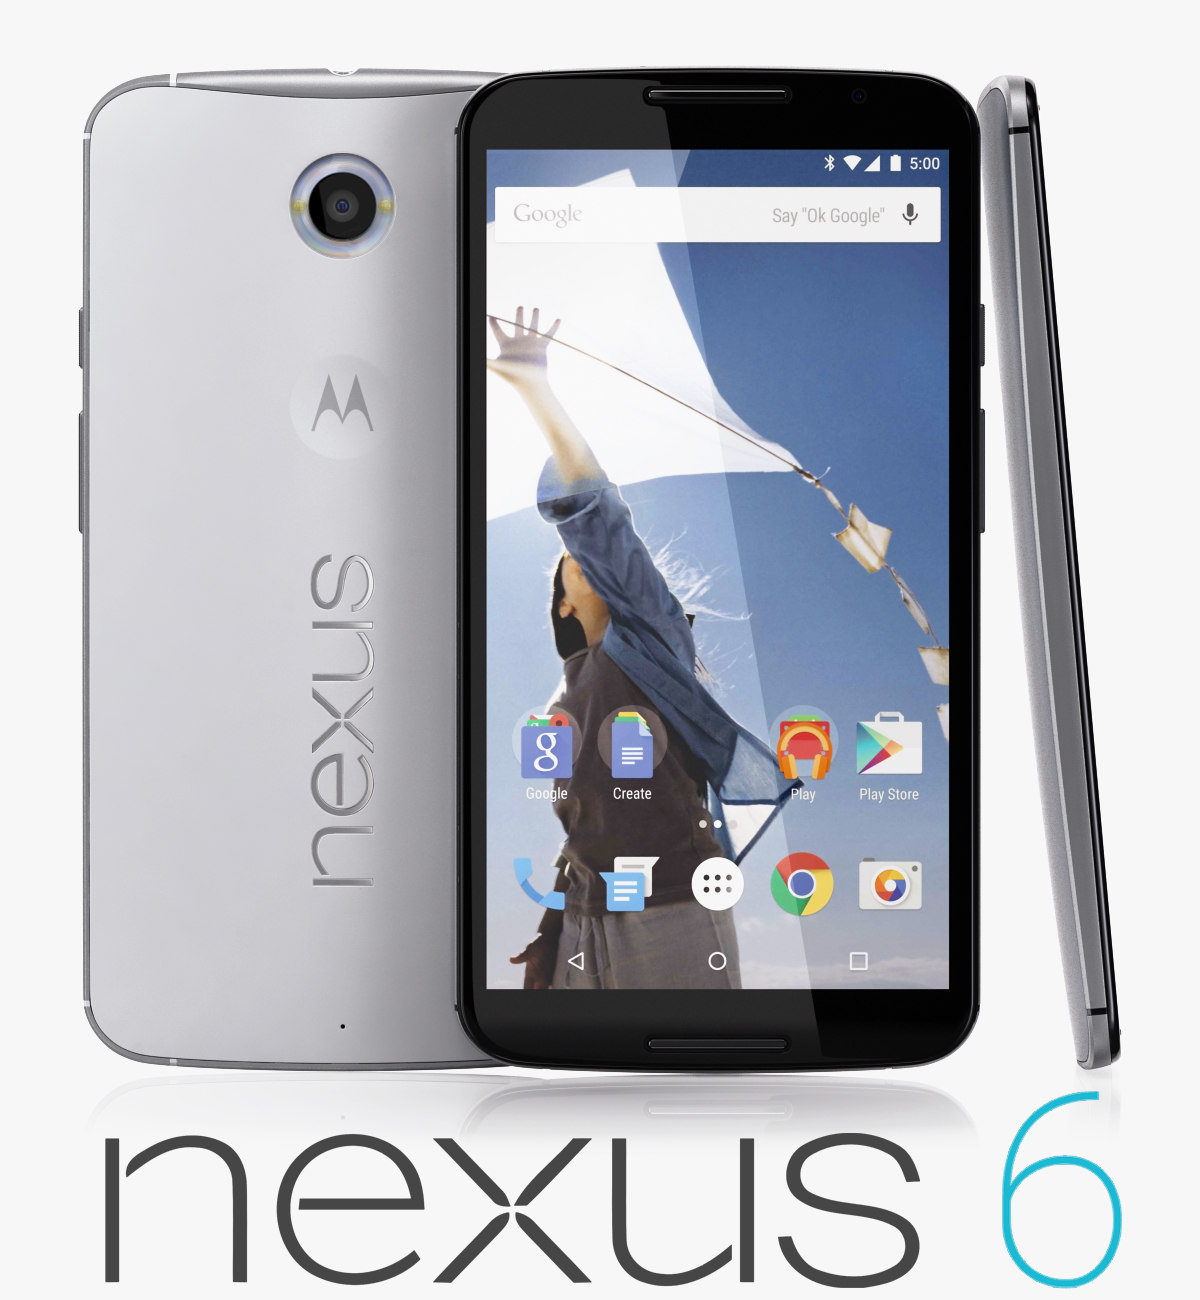 Nexus_6_01.jpg